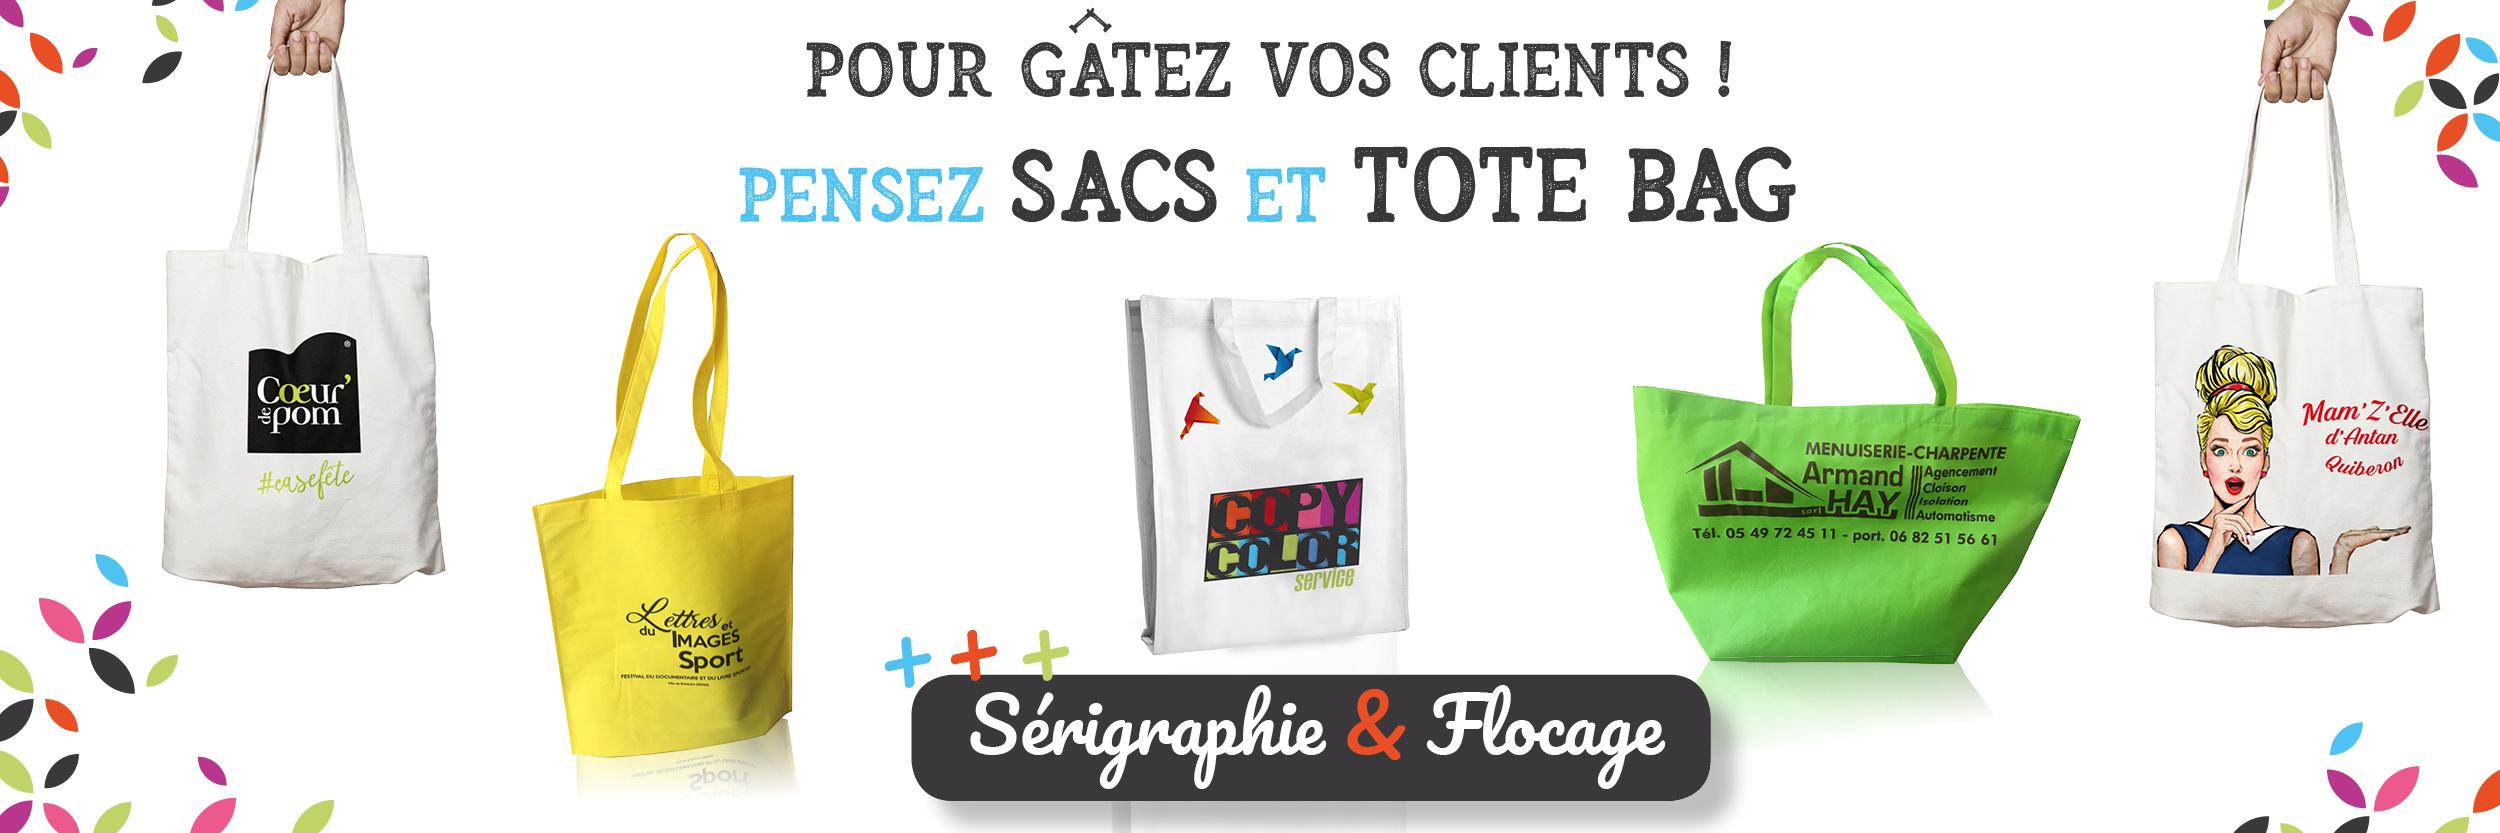 Bannières WEB_Totebag_Teeshirt_Tiragephotos-Copycolorbressuire_confetti